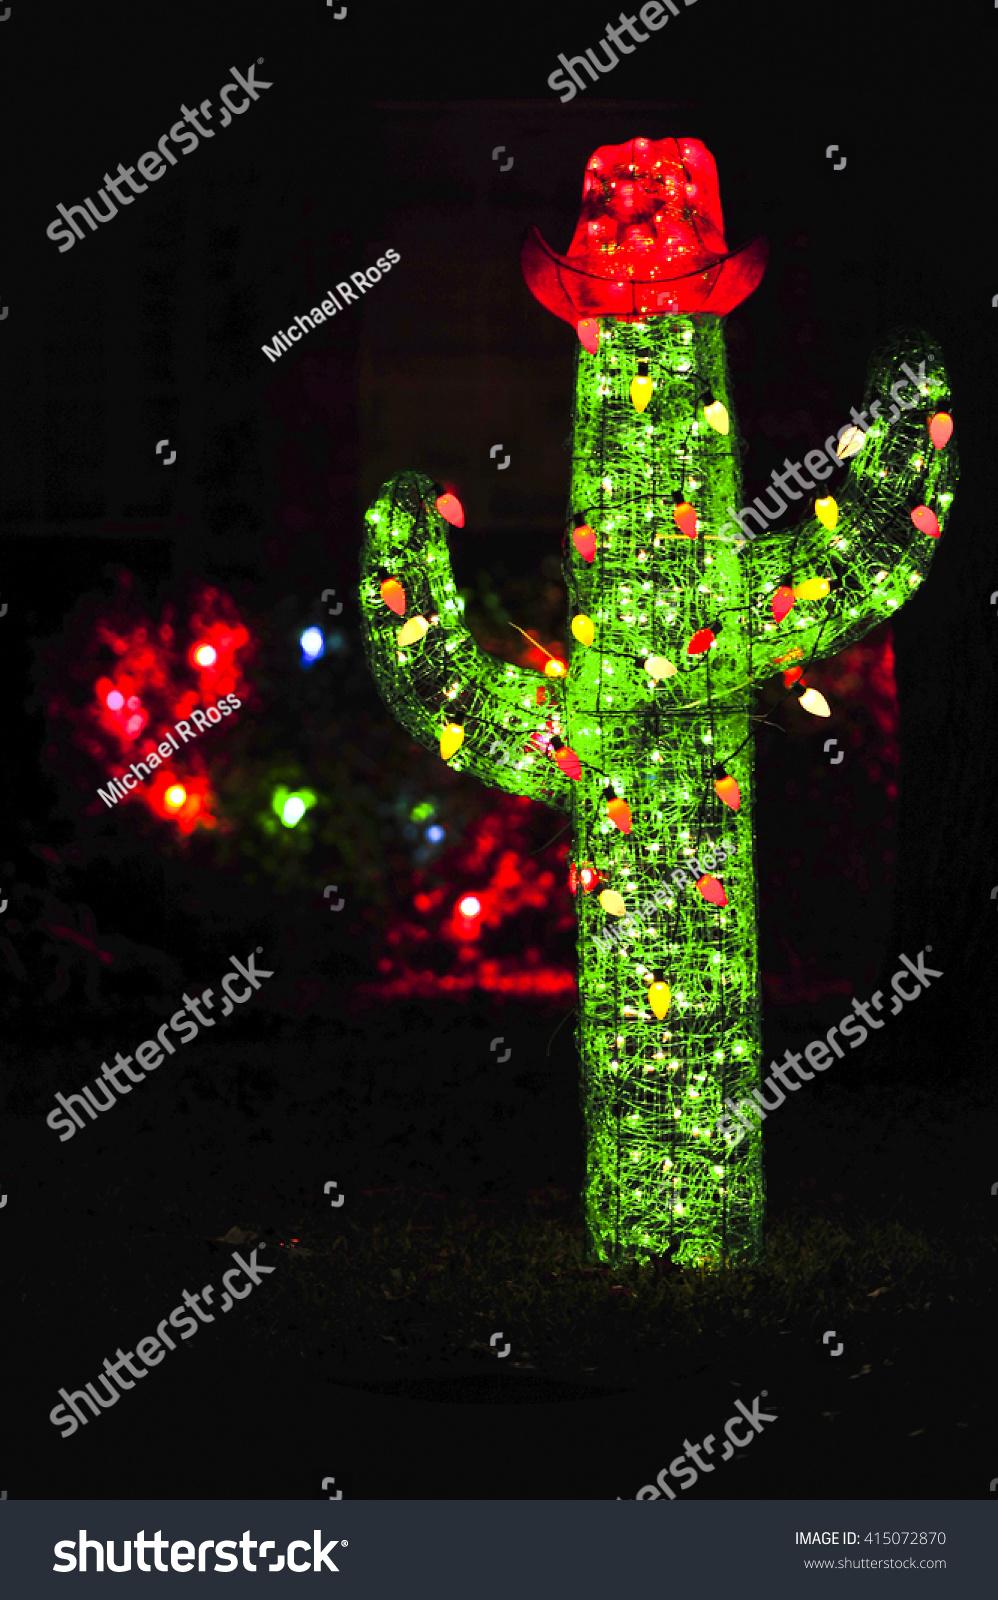 cactus christmas lights blurry